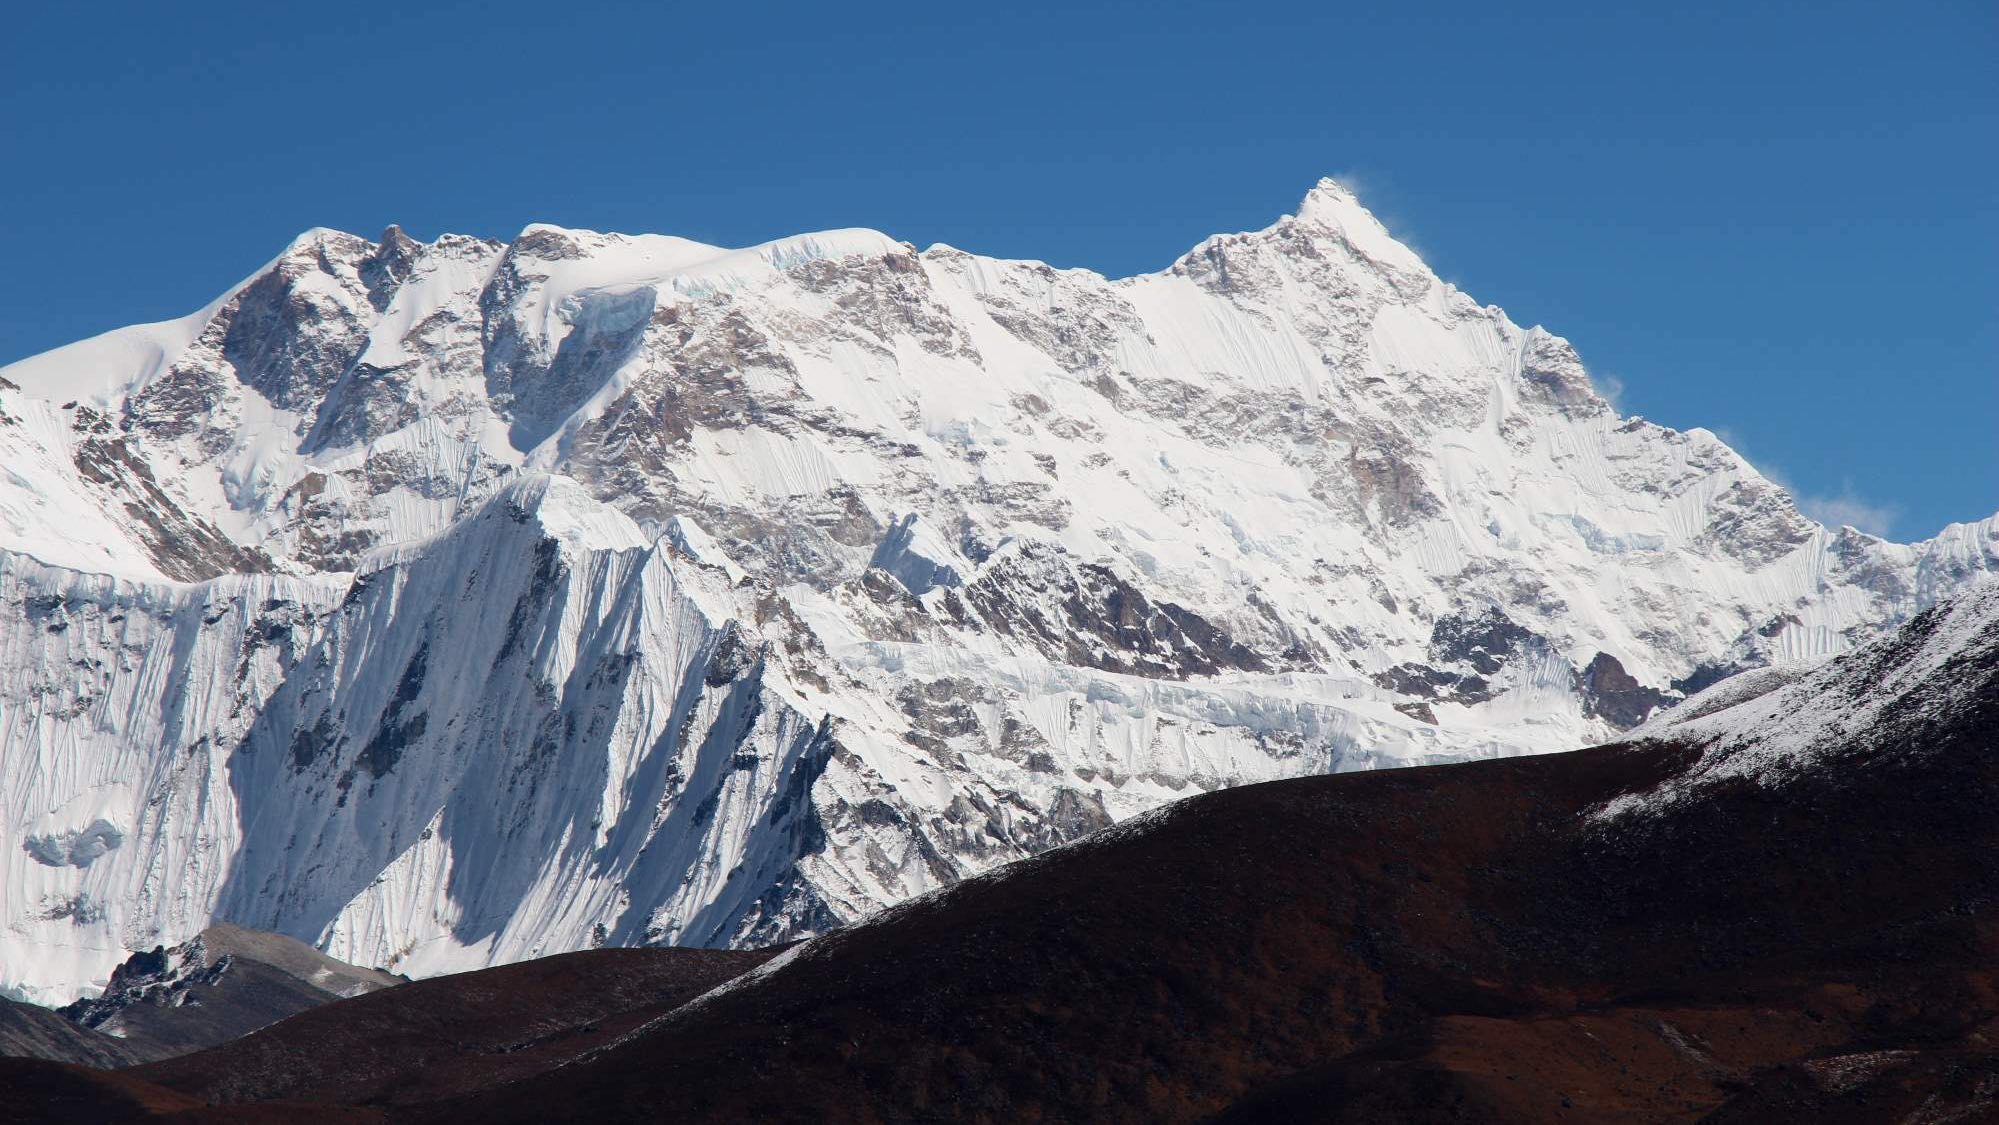 The Snowman trek in Bhutan